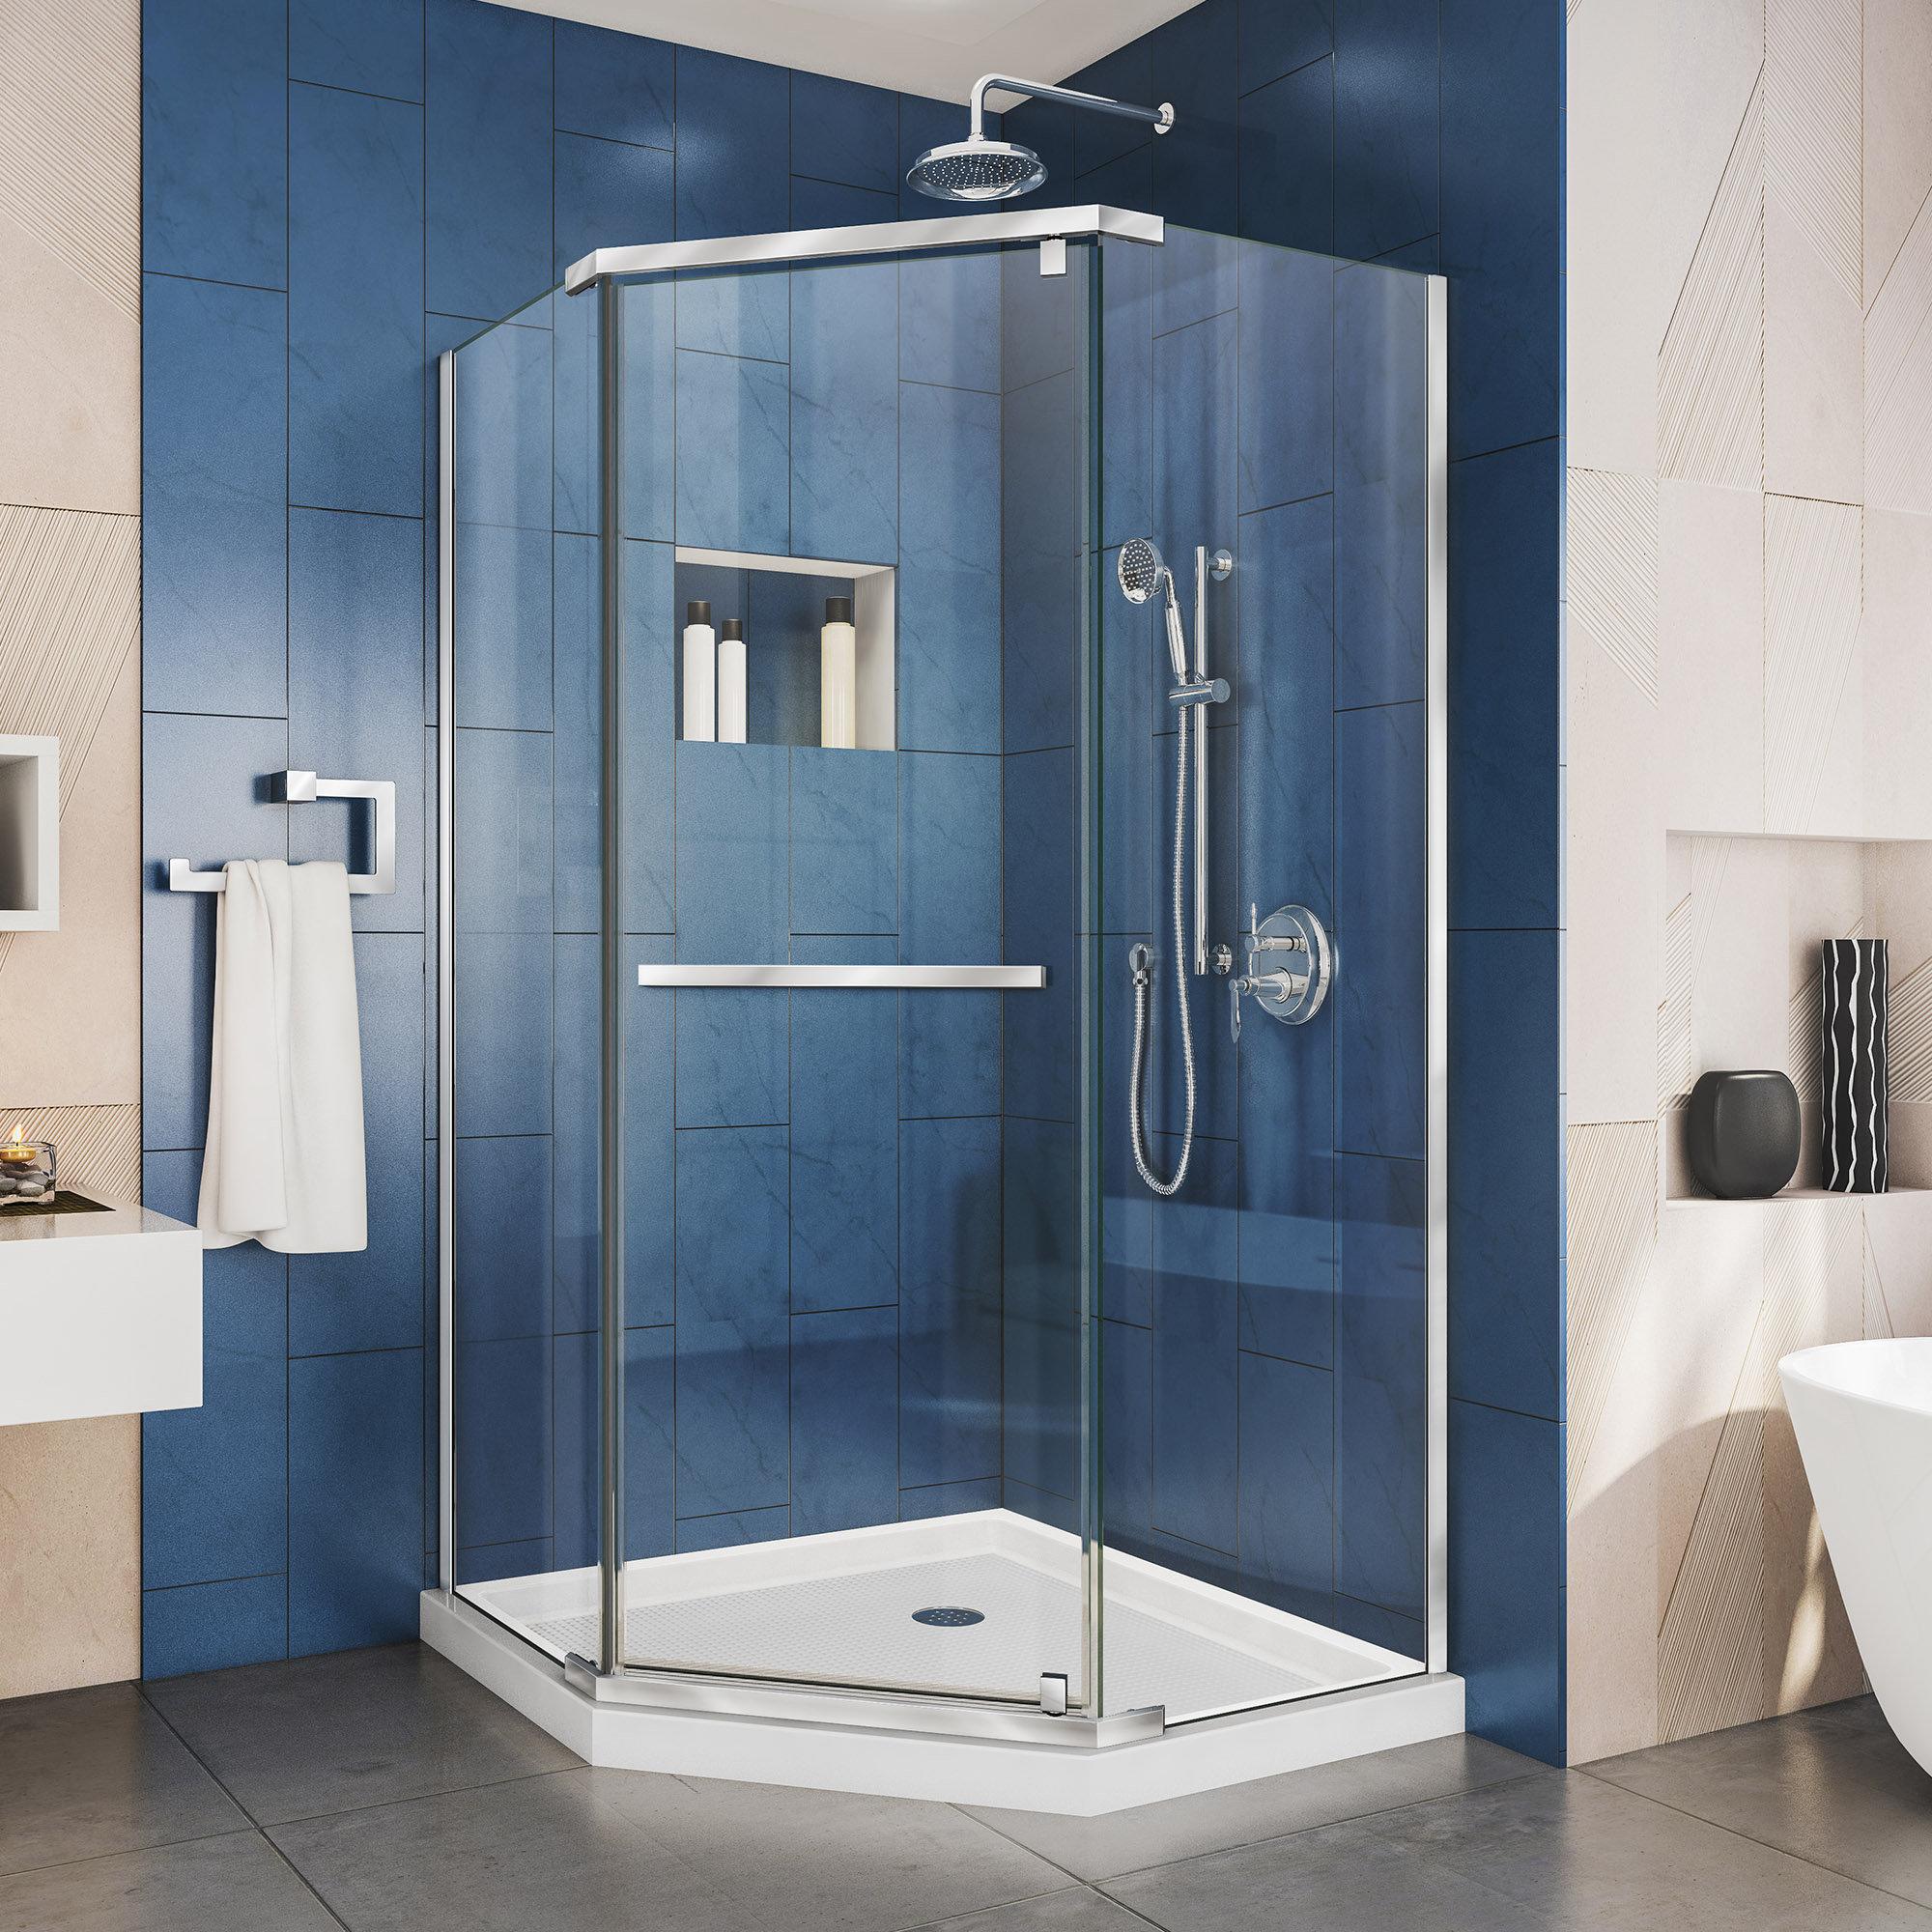 Outstanding Caulking Bathroom Shower Photos - Inspiration Bathrooms ...